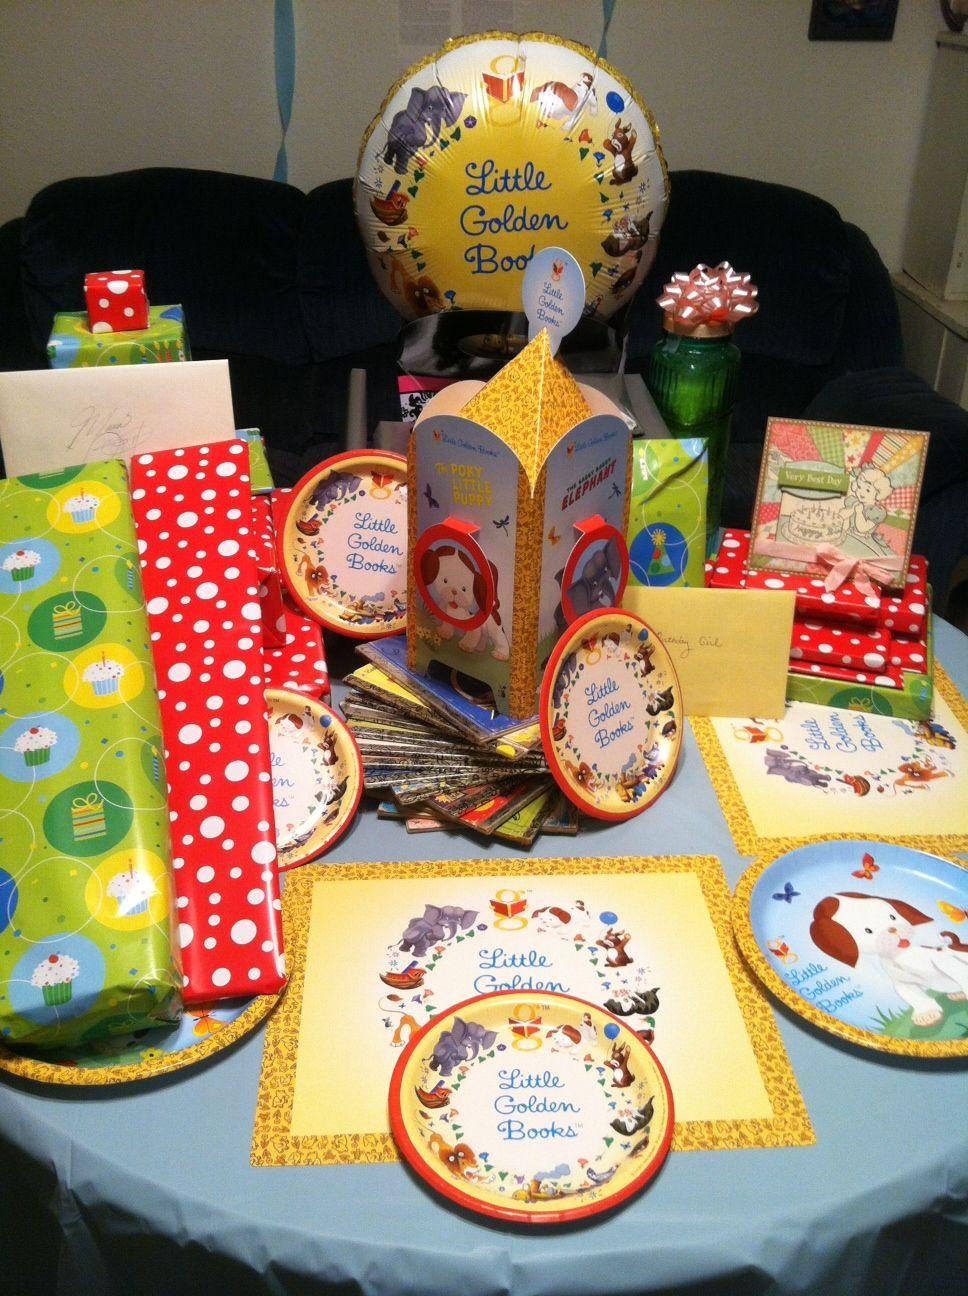 Twyla on Tuesday Birthday Party Book themed birthday